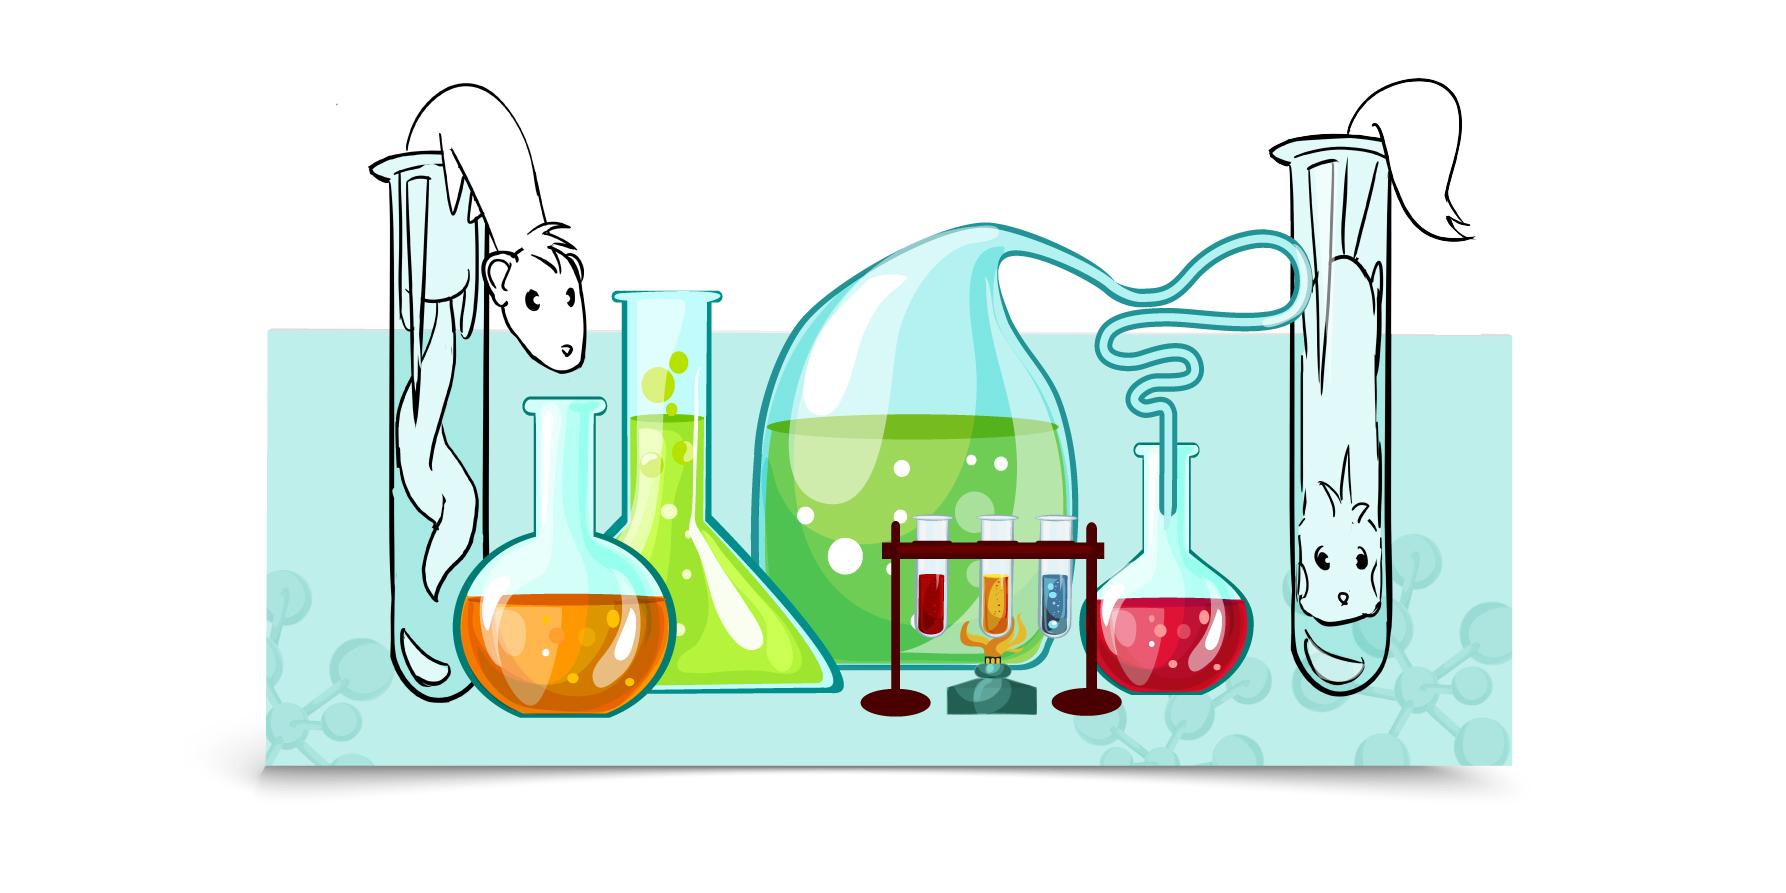 jane-et-bernie-illustrations-furet-company-furet-lab